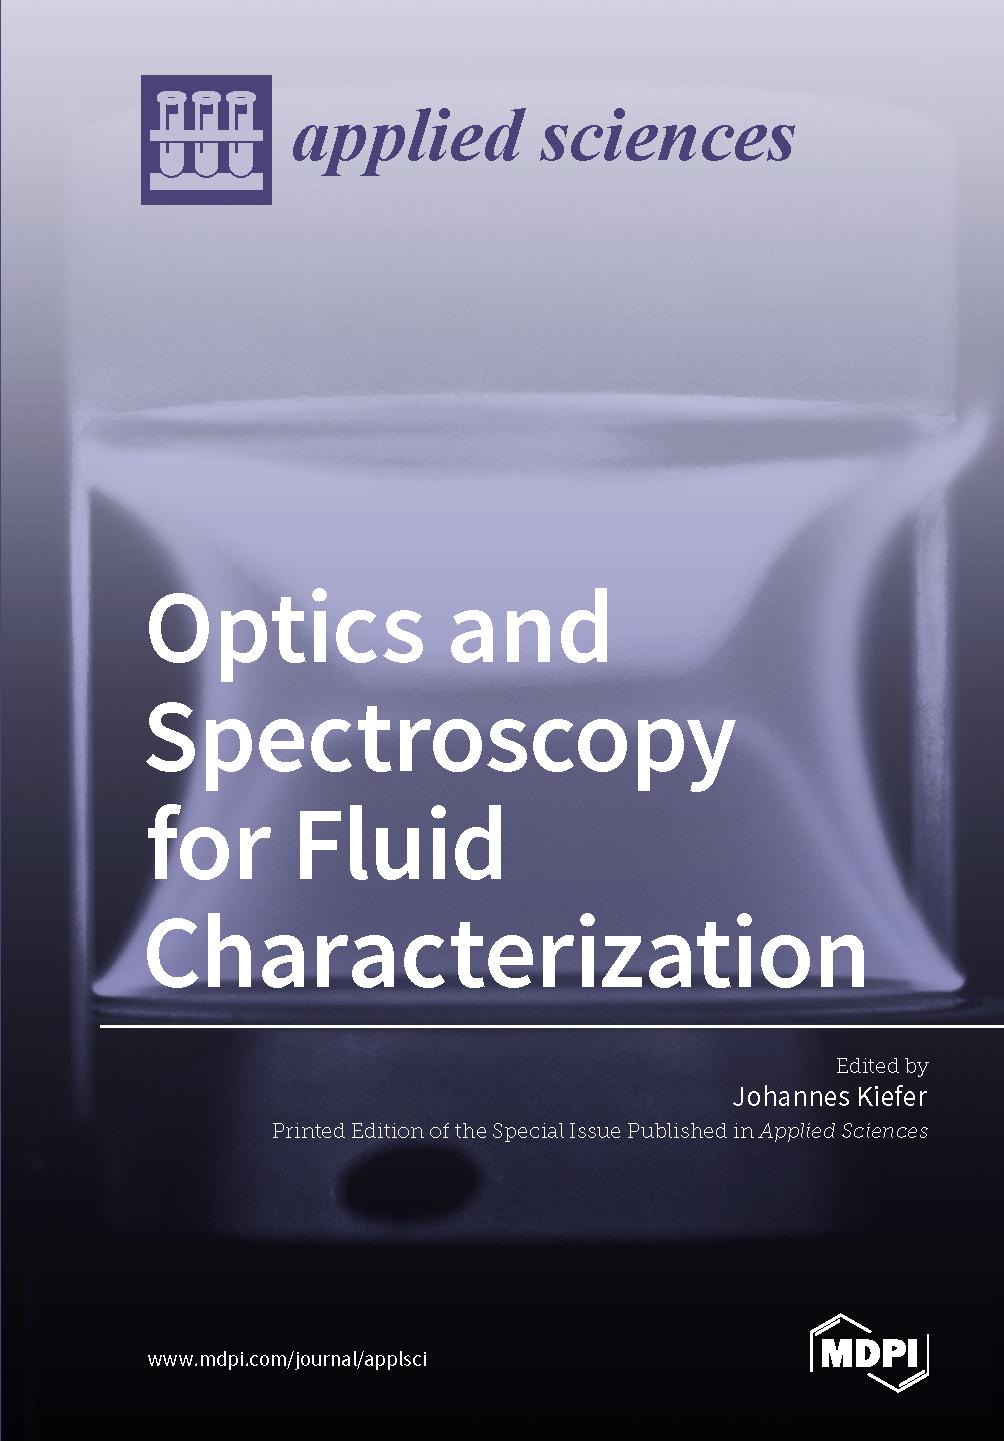 Optics and Spectroscopy for Fluid Characterization